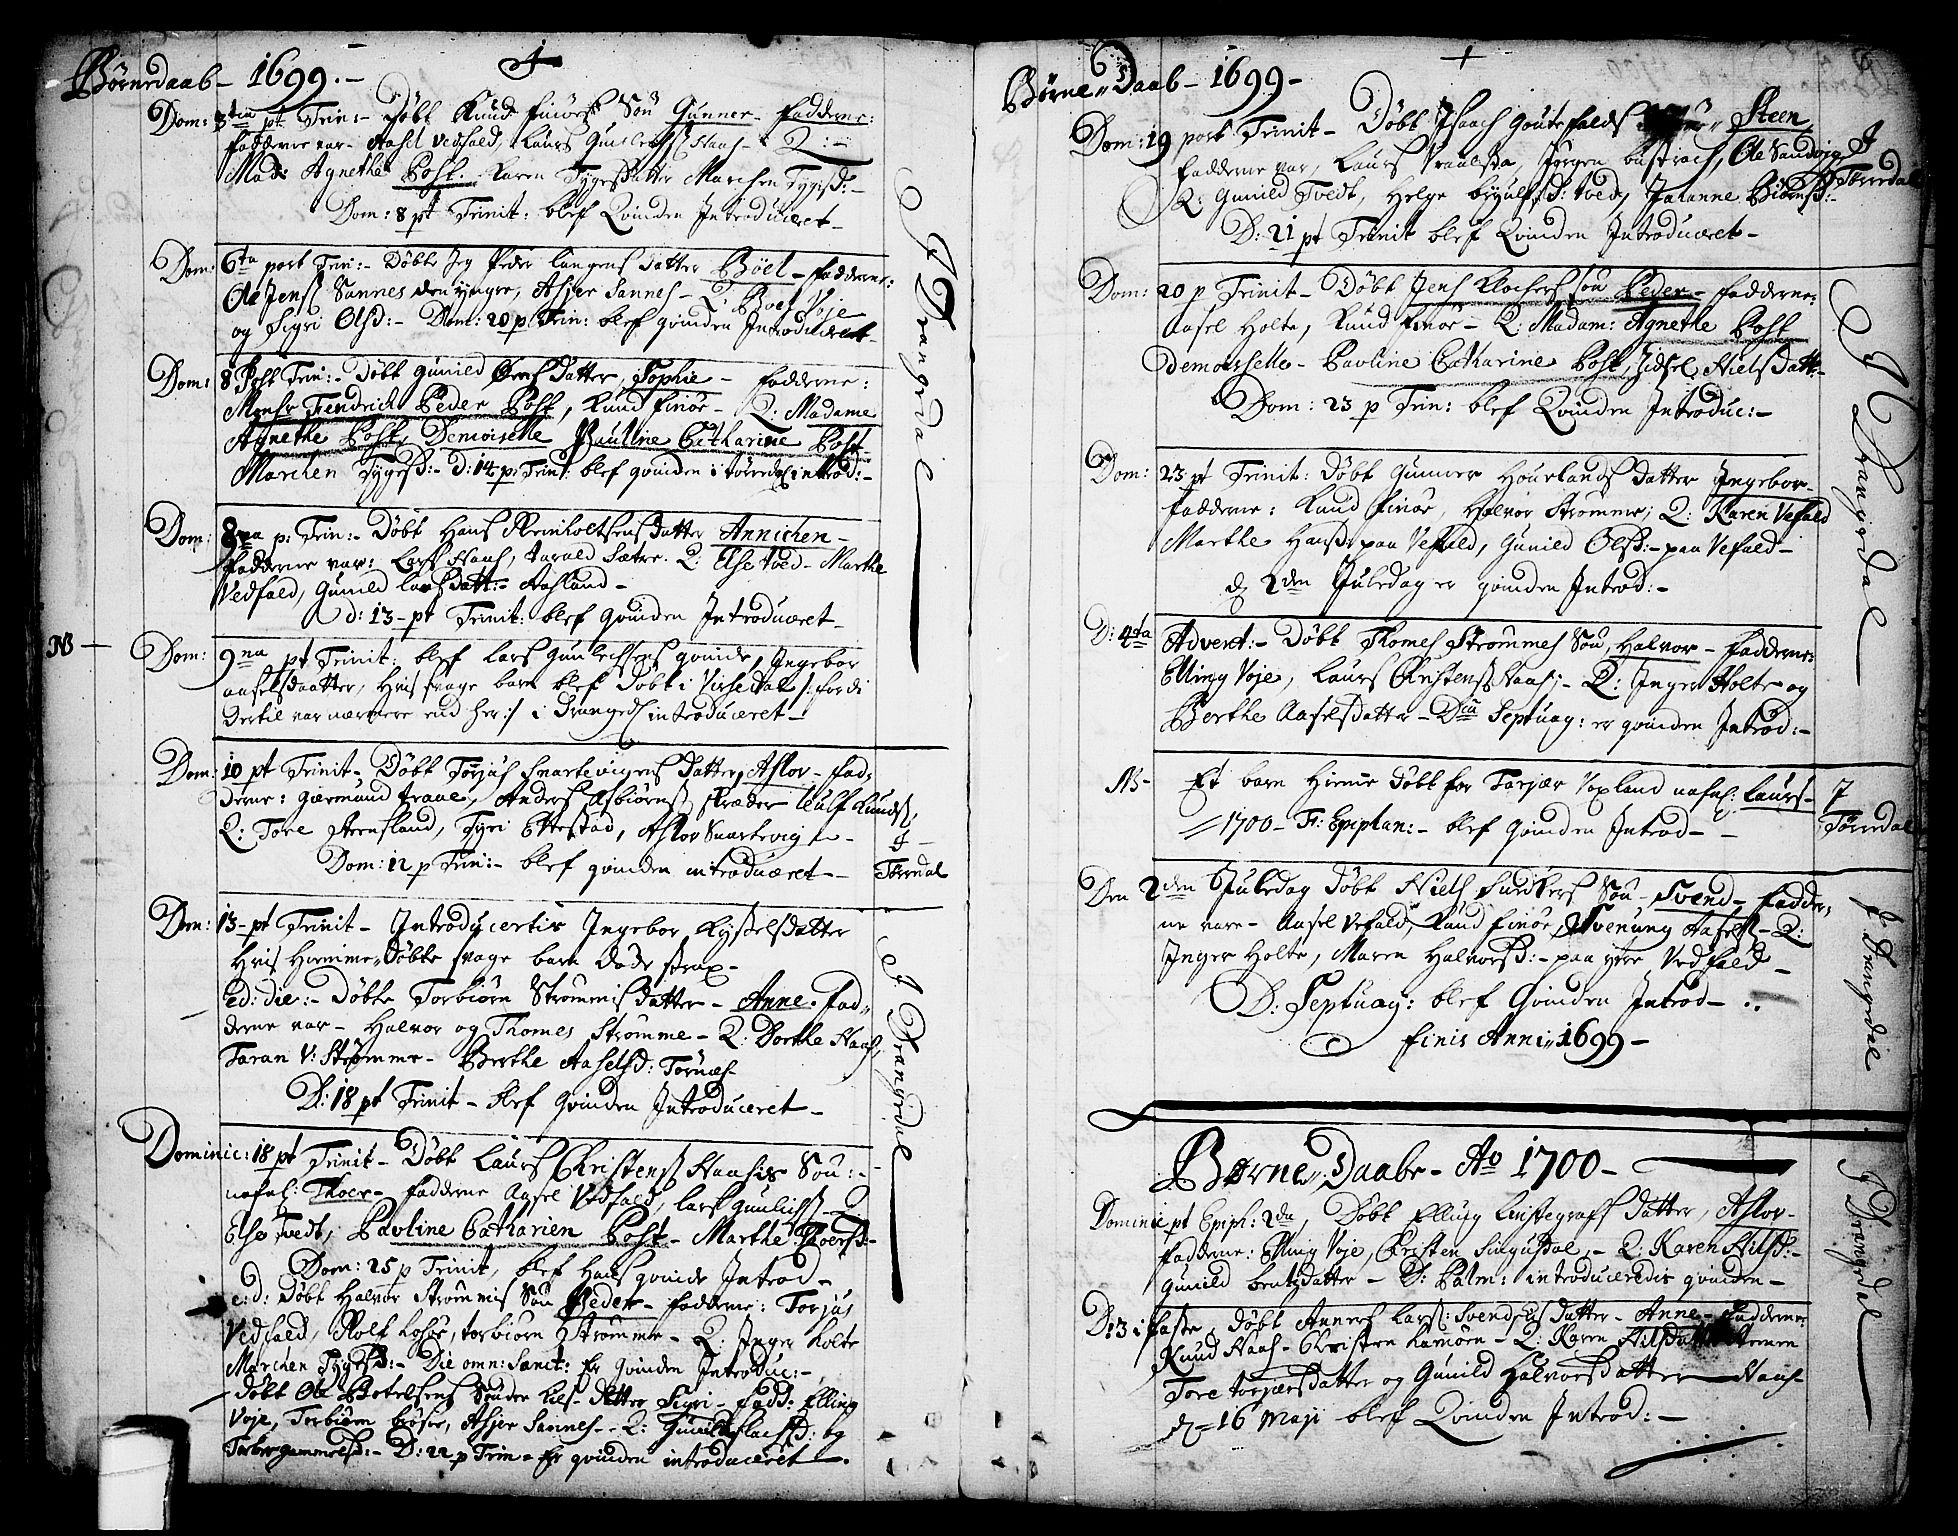 SAKO, Drangedal kirkebøker, F/Fa/L0001: Ministerialbok nr. 1, 1697-1767, s. 6